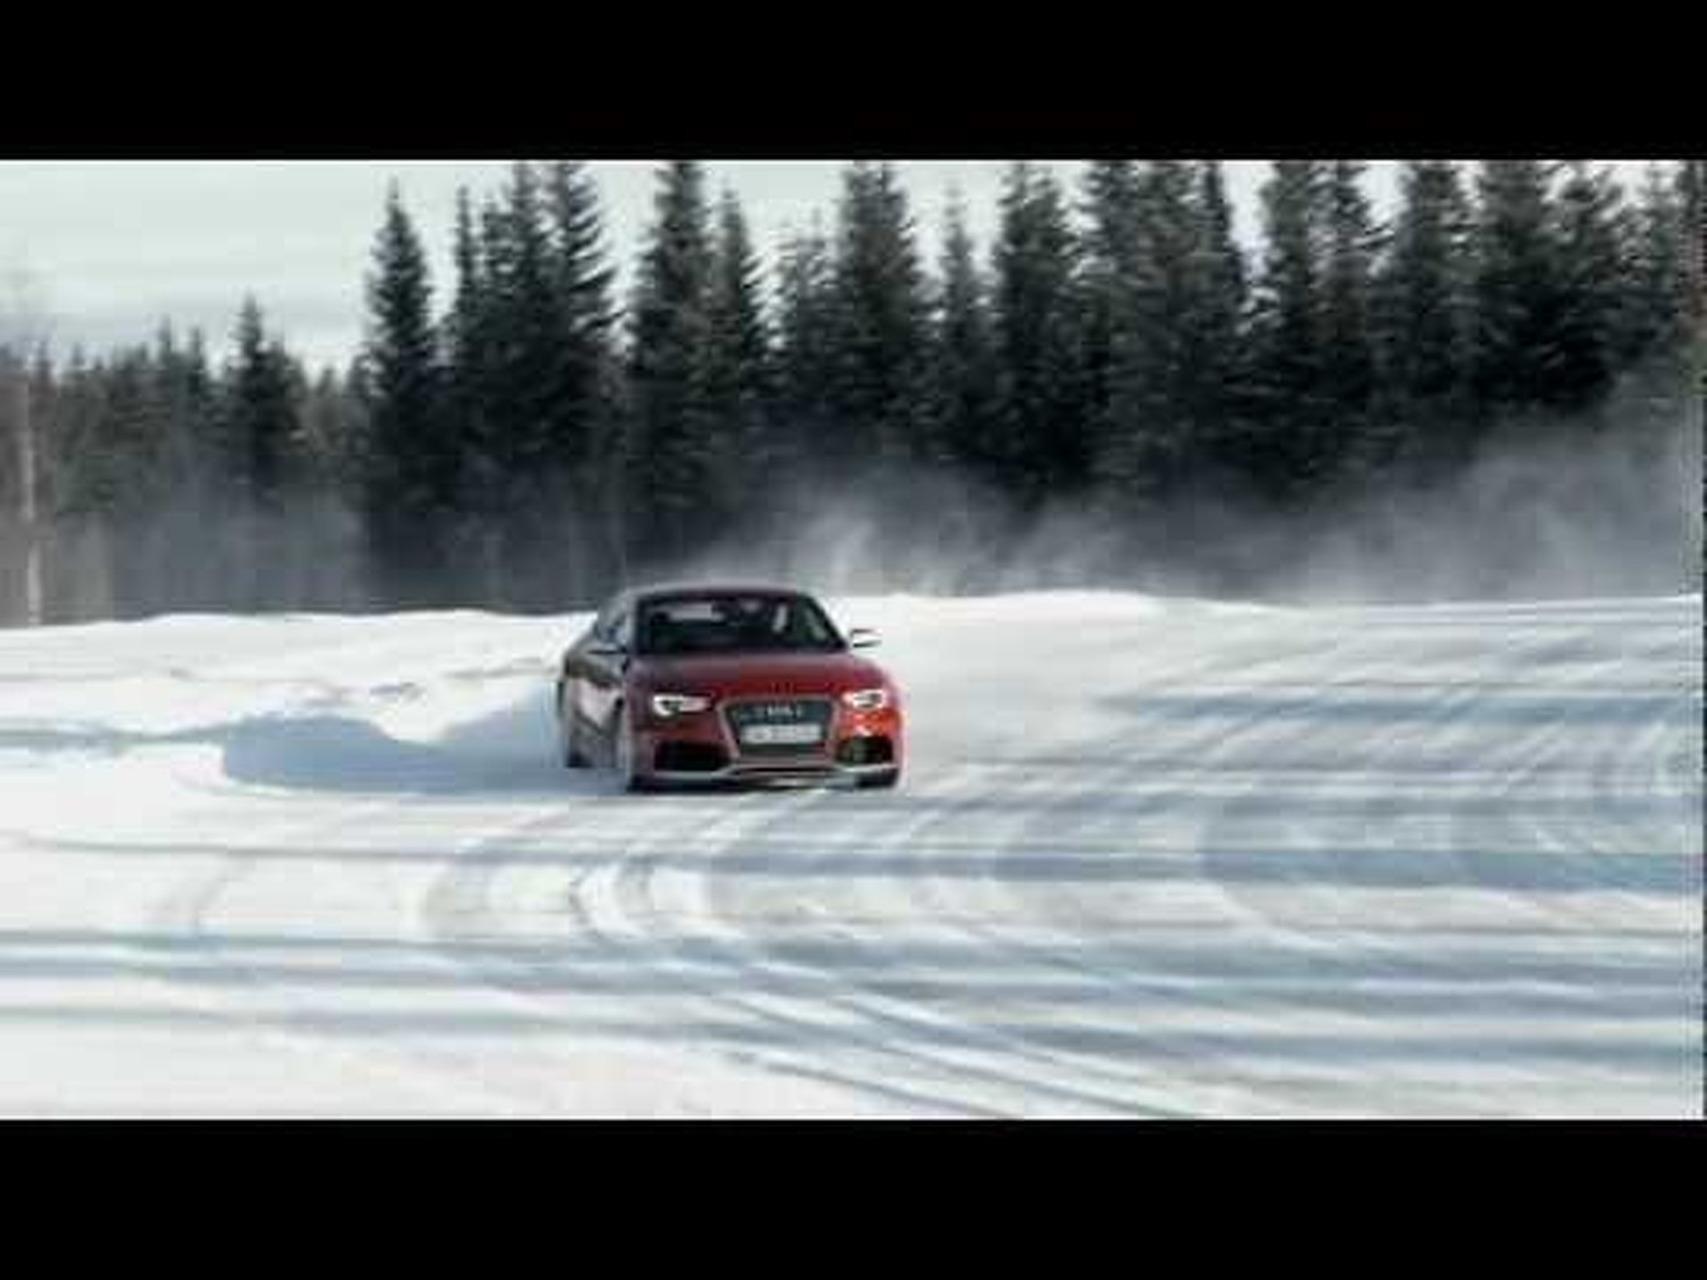 2012 Audi RS 5 Snow Drifting